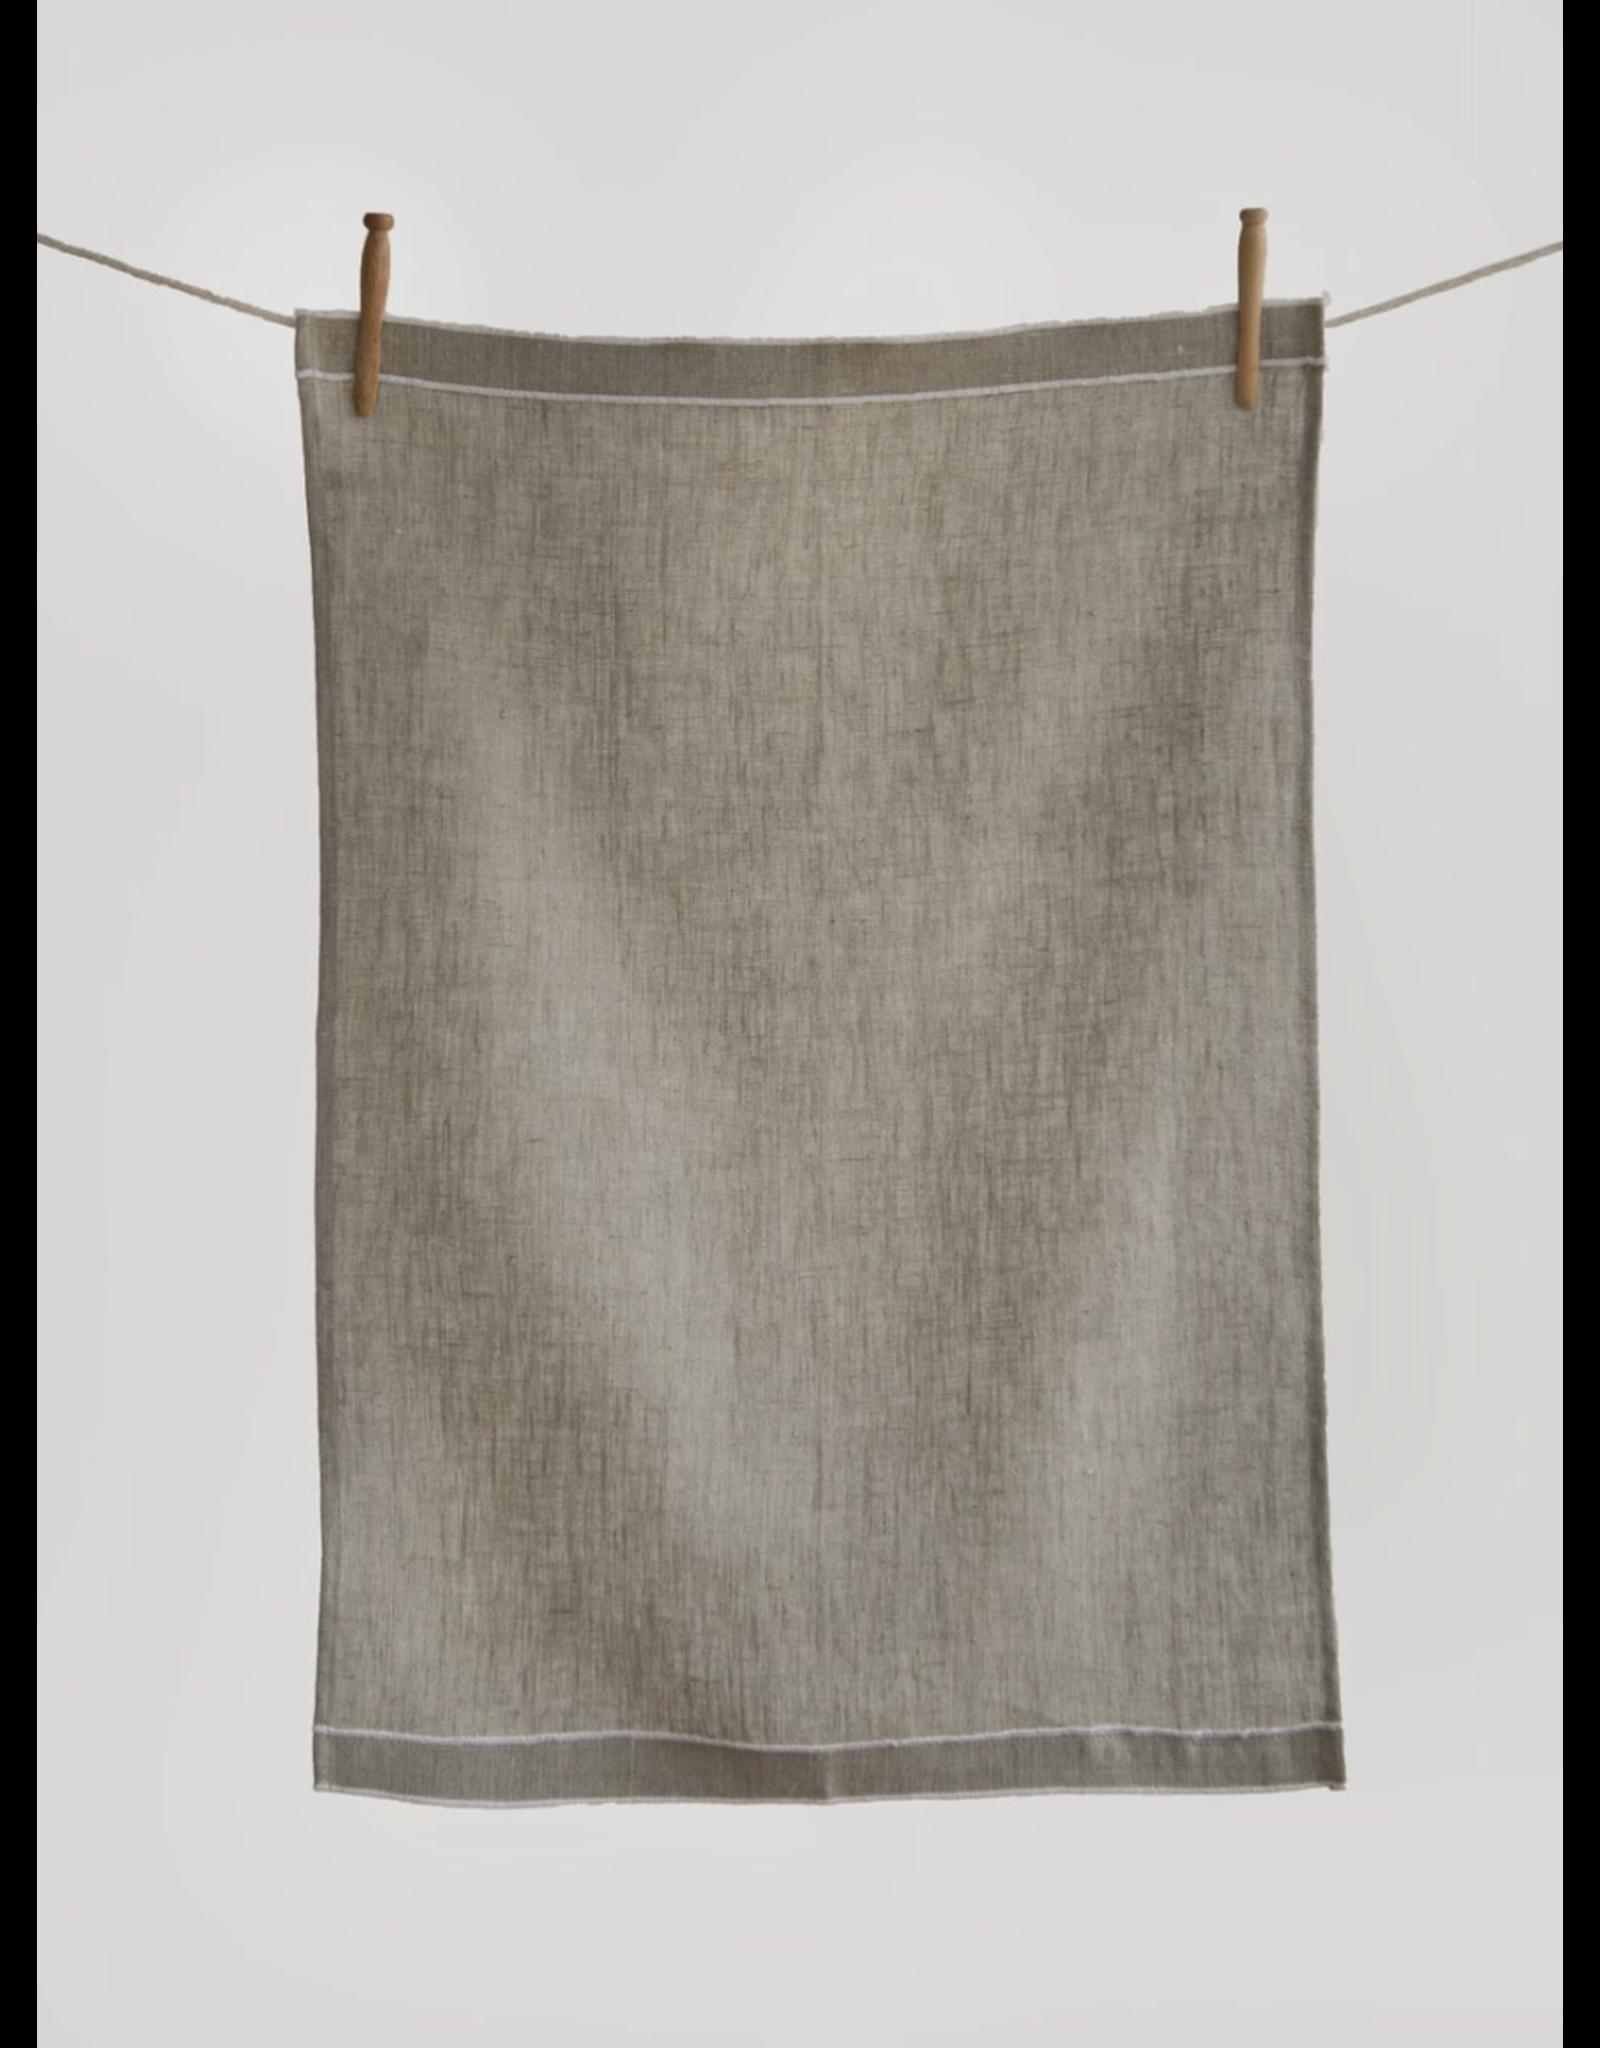 Double Border Linen Tea Towel - Natural/white